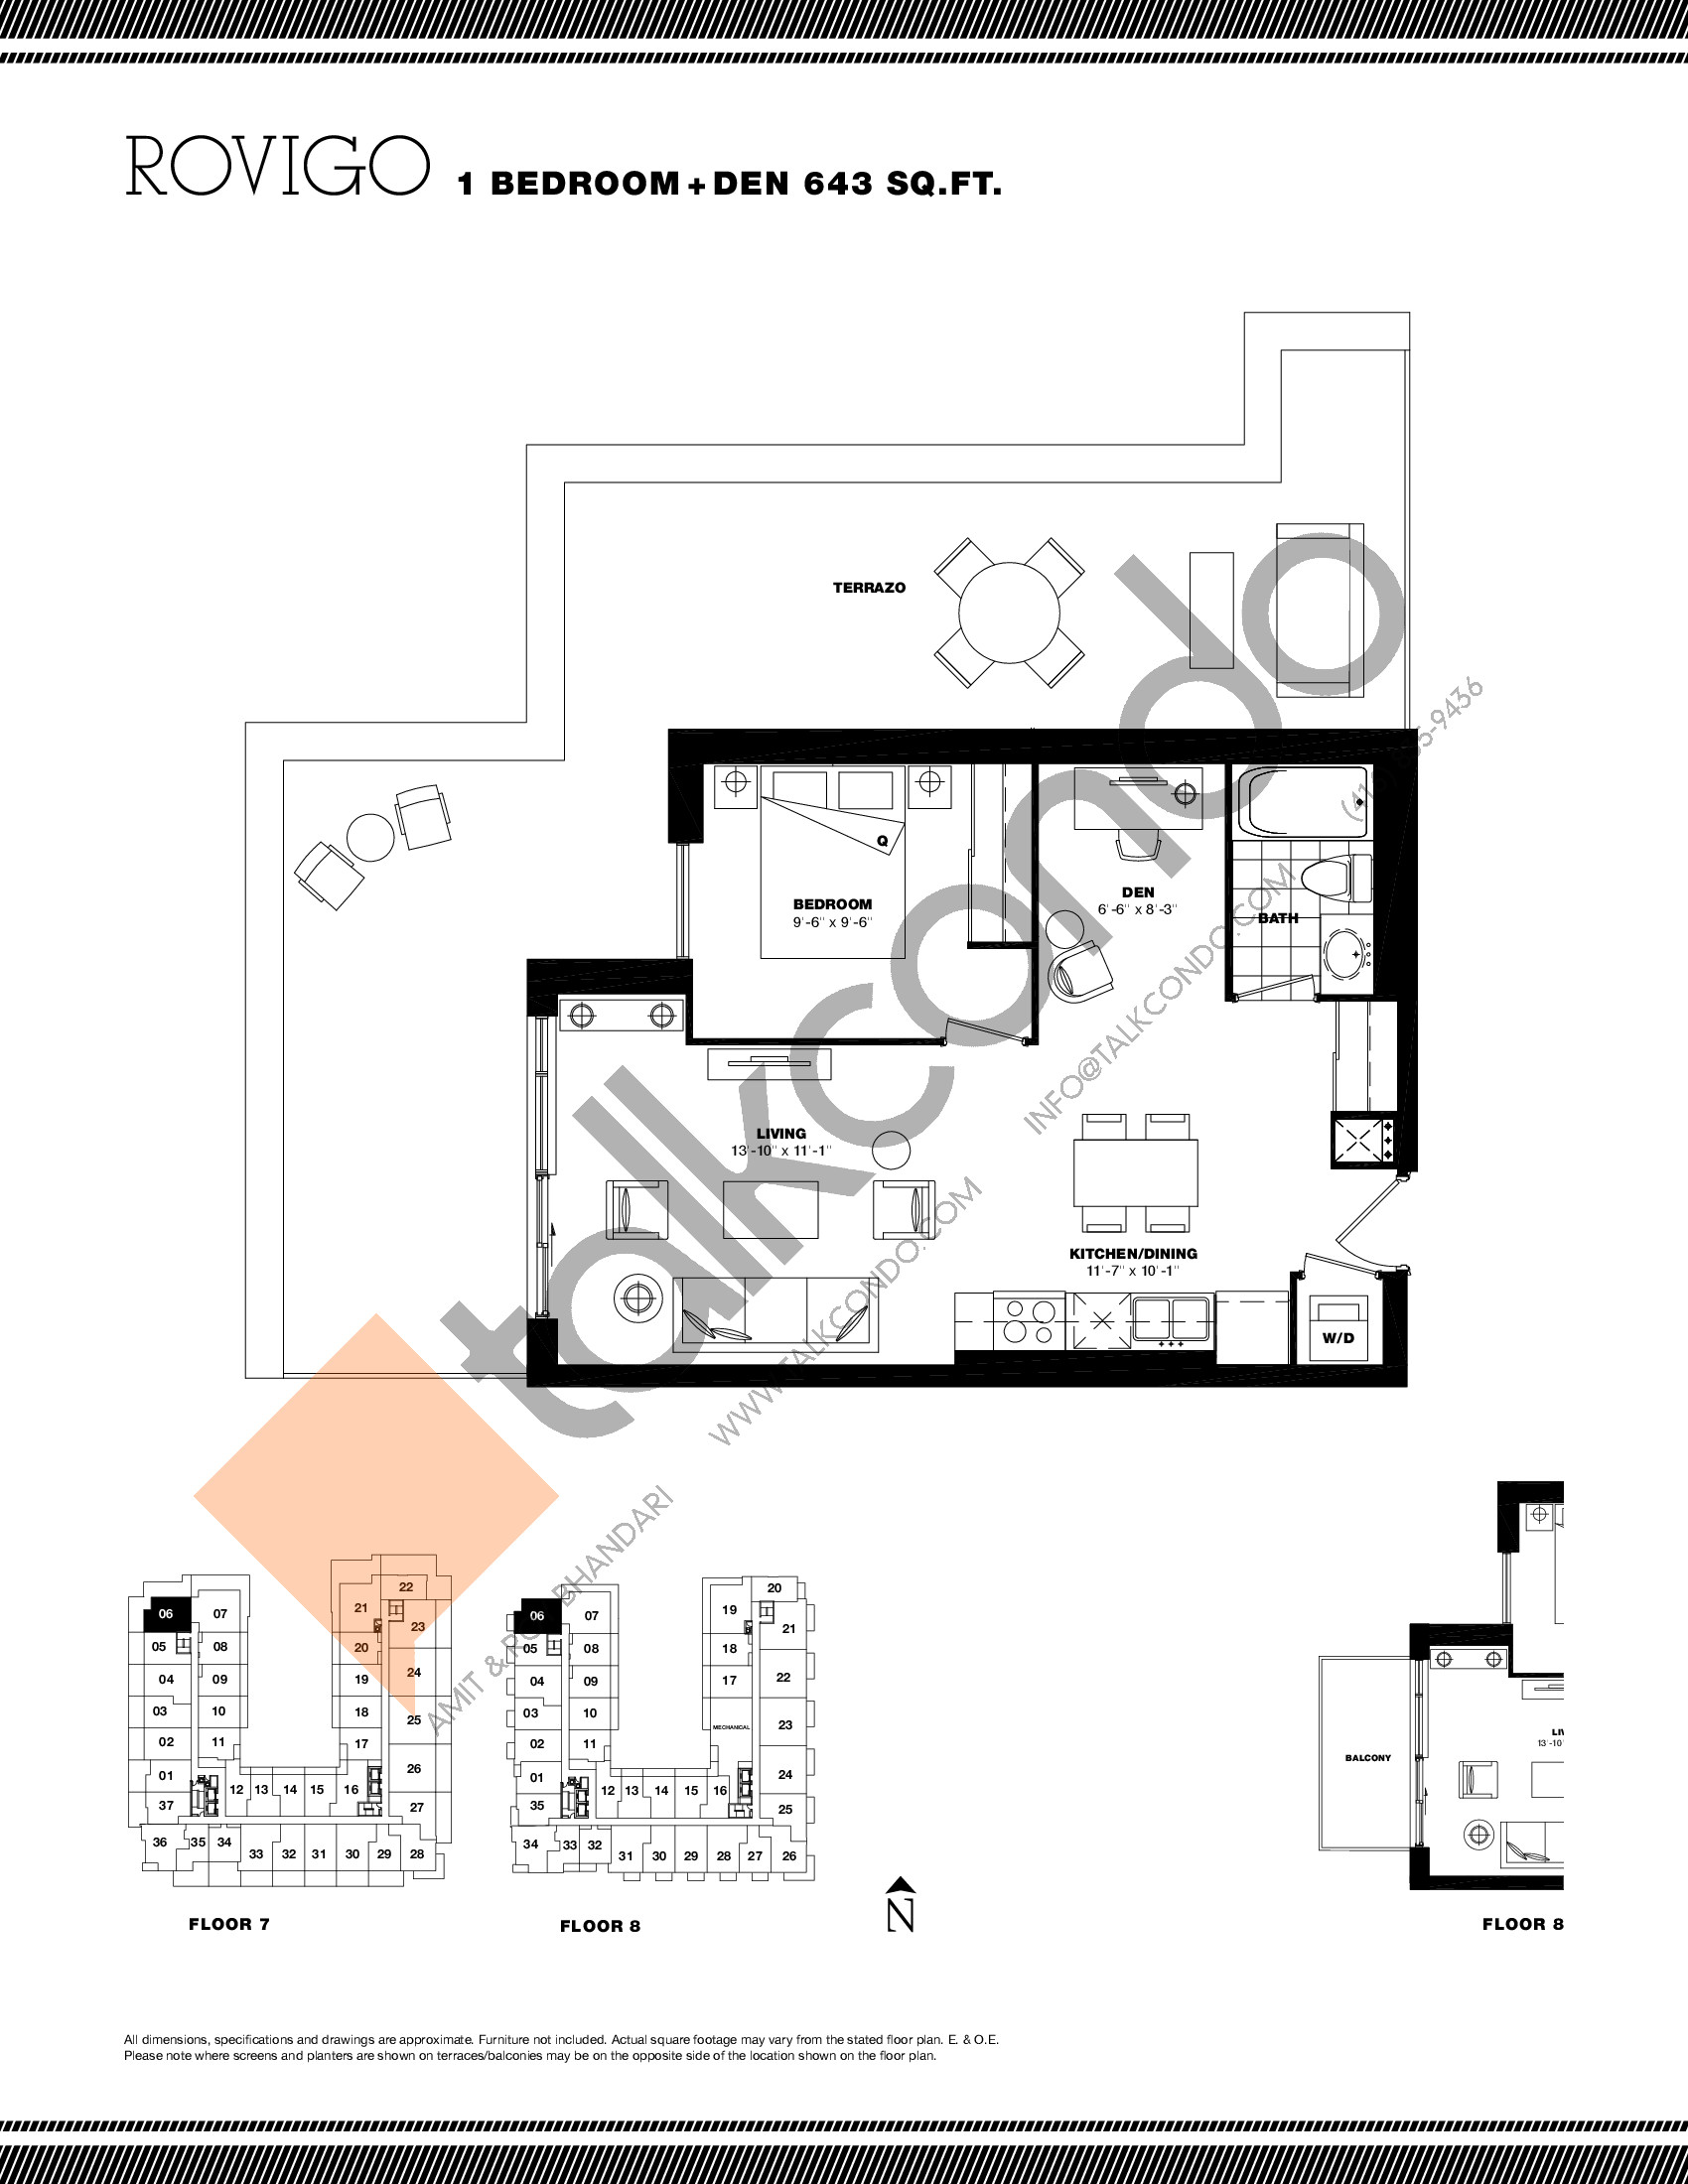 Rovigo Floor Plan at Residenze Palazzo at Treviso 3 Condos - 643 sq.ft